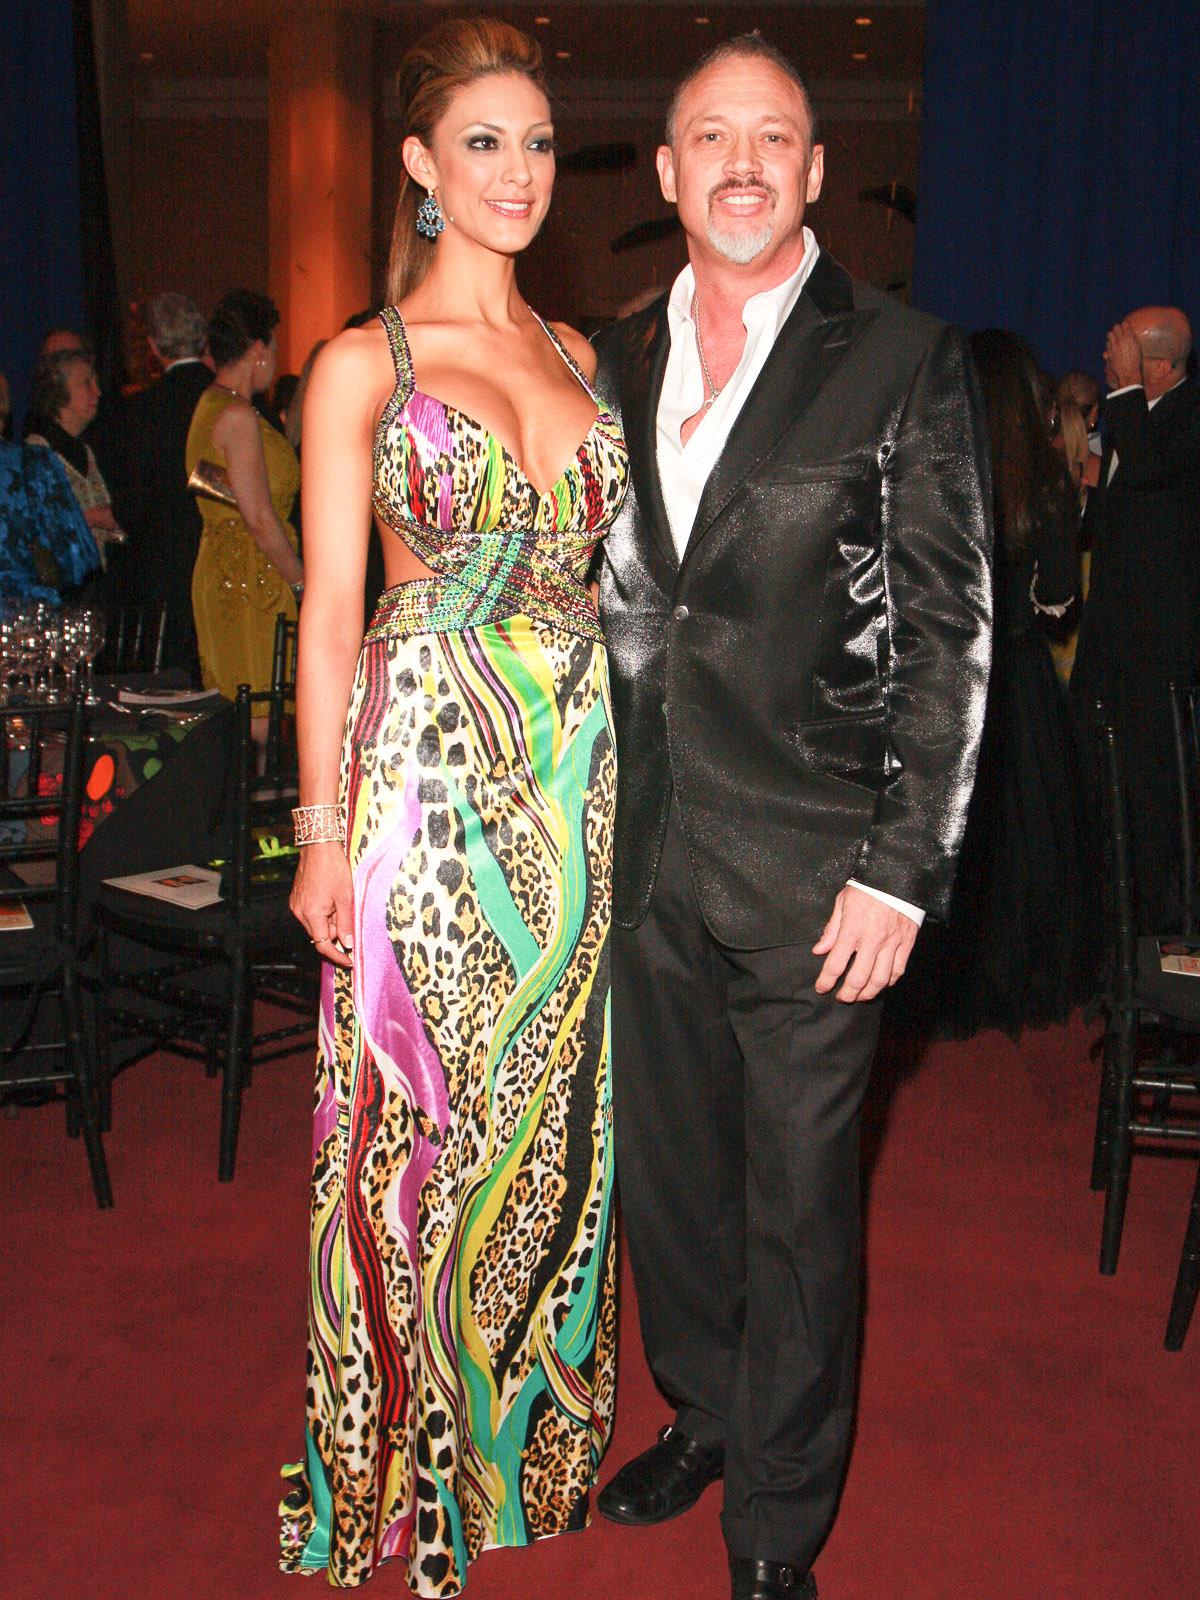 News_Ballet Ball_Feb. 2010_Nancy Burford_Robert Burford_123